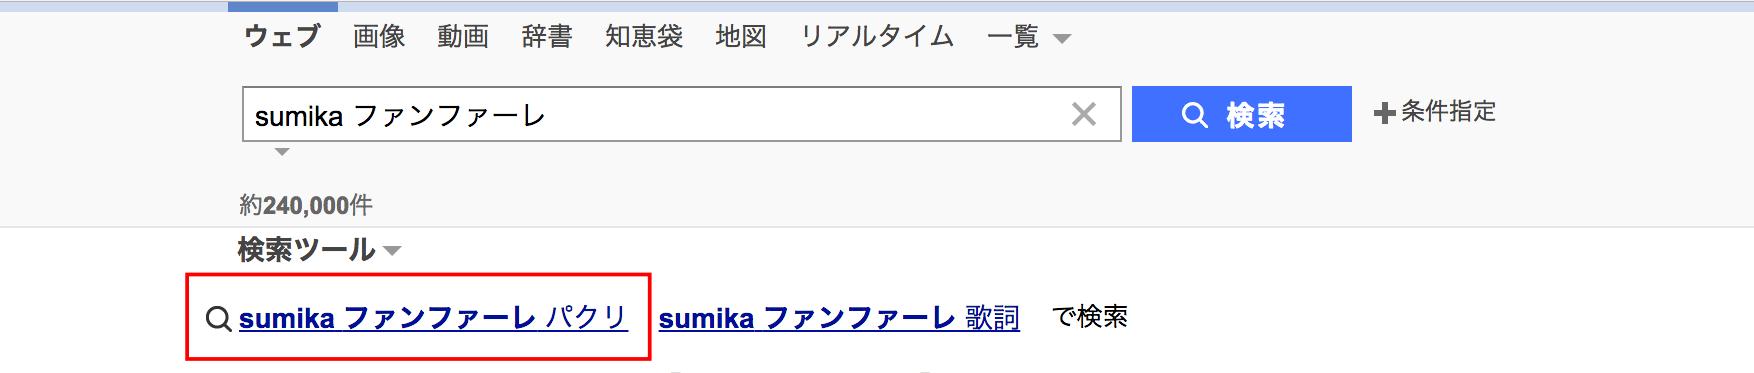 sumika_kashi